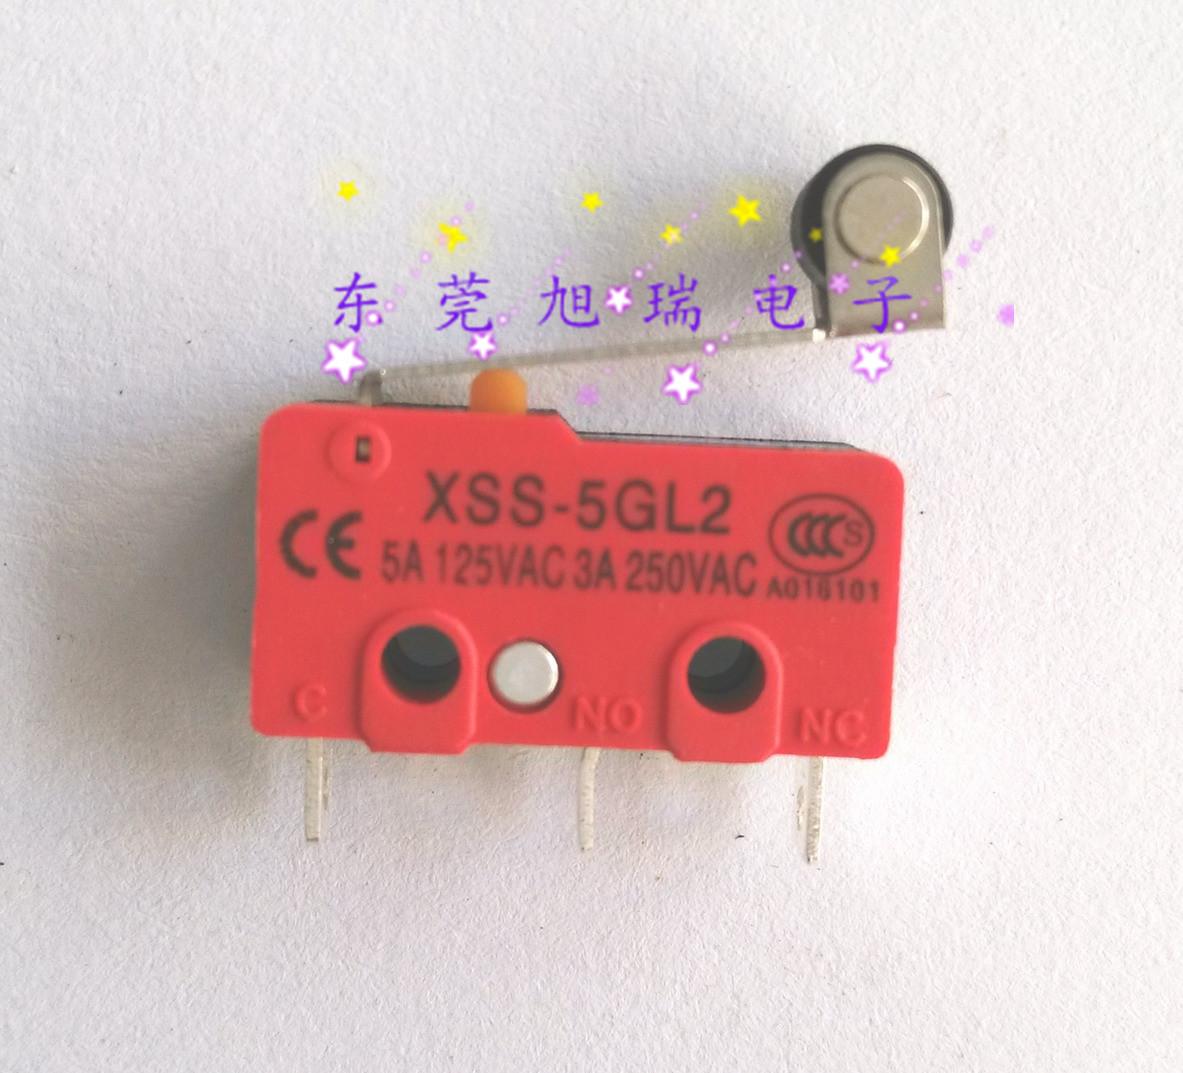 Authentique [XURUI Xu - Rui] micro - commutateur XSS-5GL2 de contact en argent